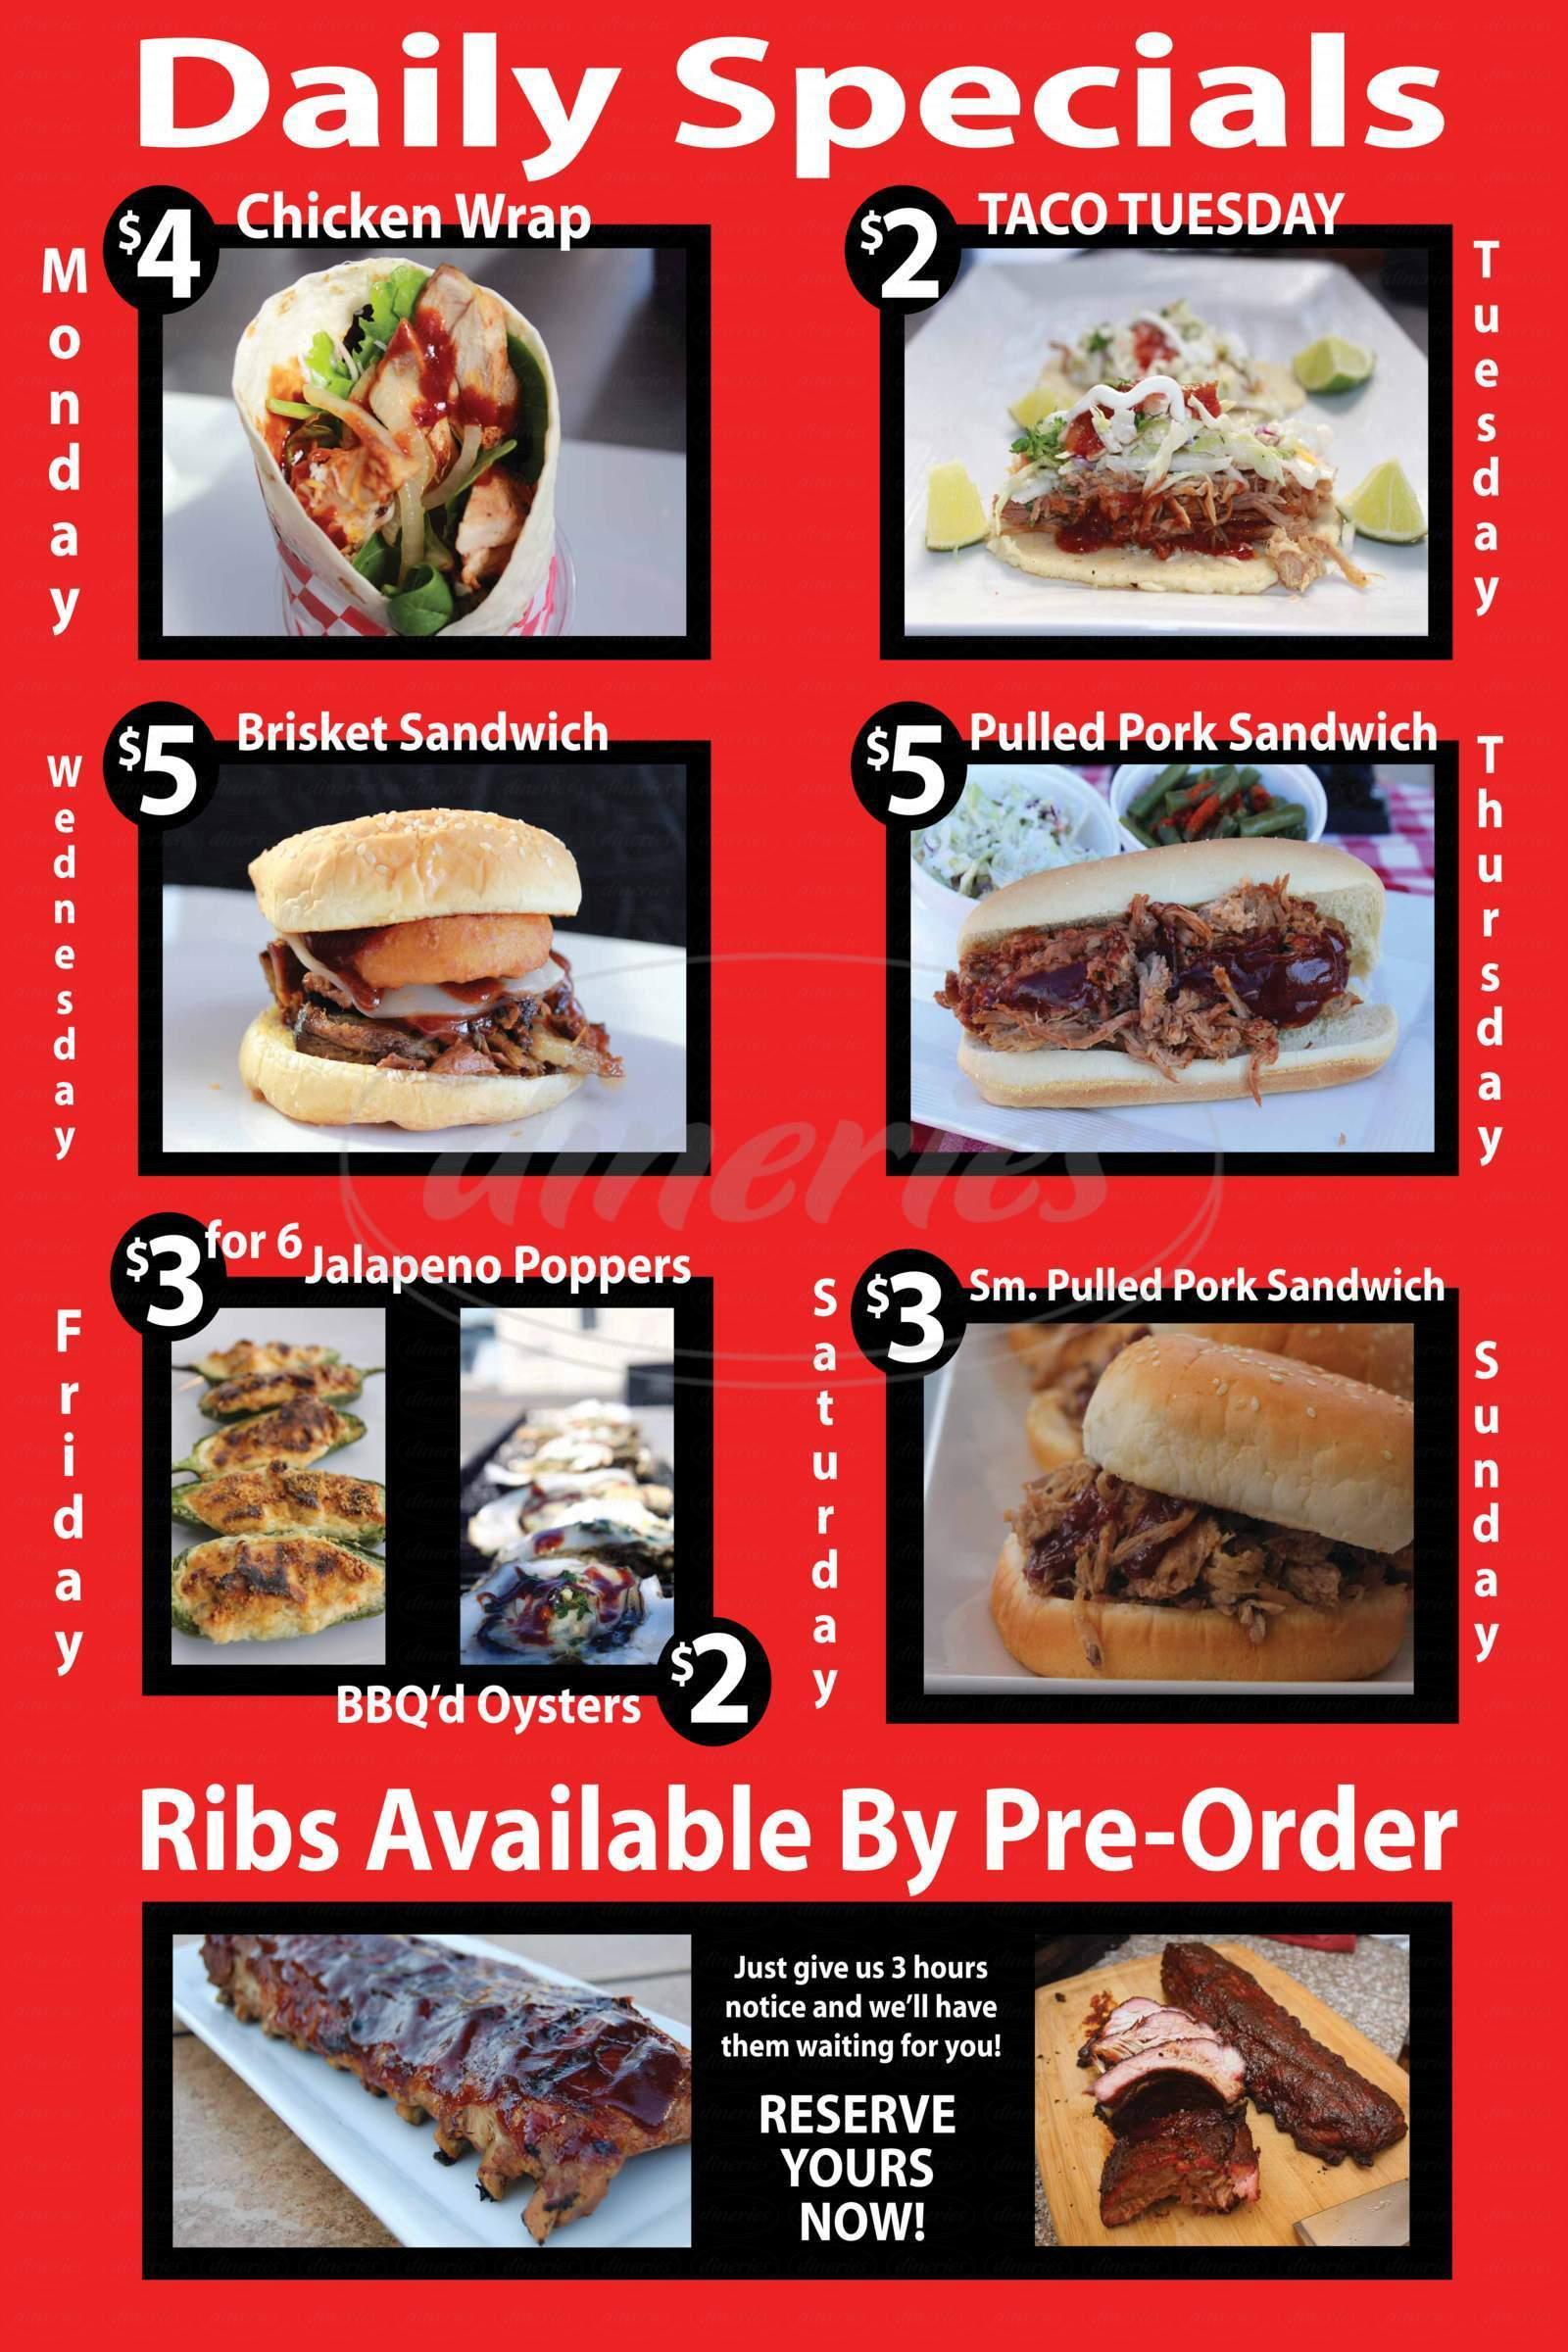 menu for Smokin' Friday BBQ